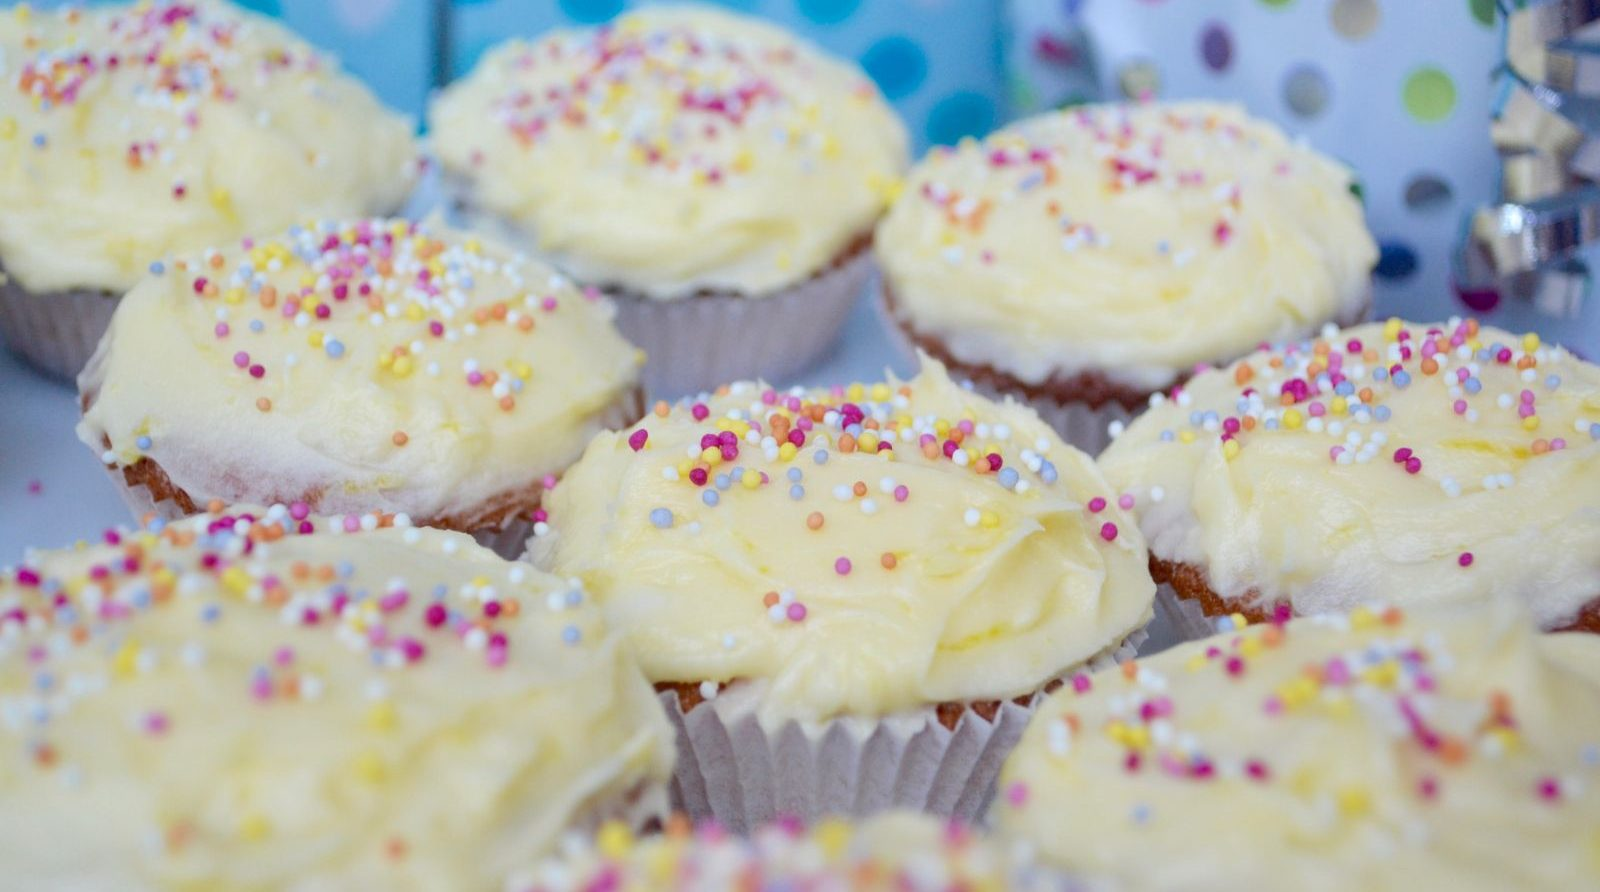 Recipe: Tangy Lemon Cupcakes